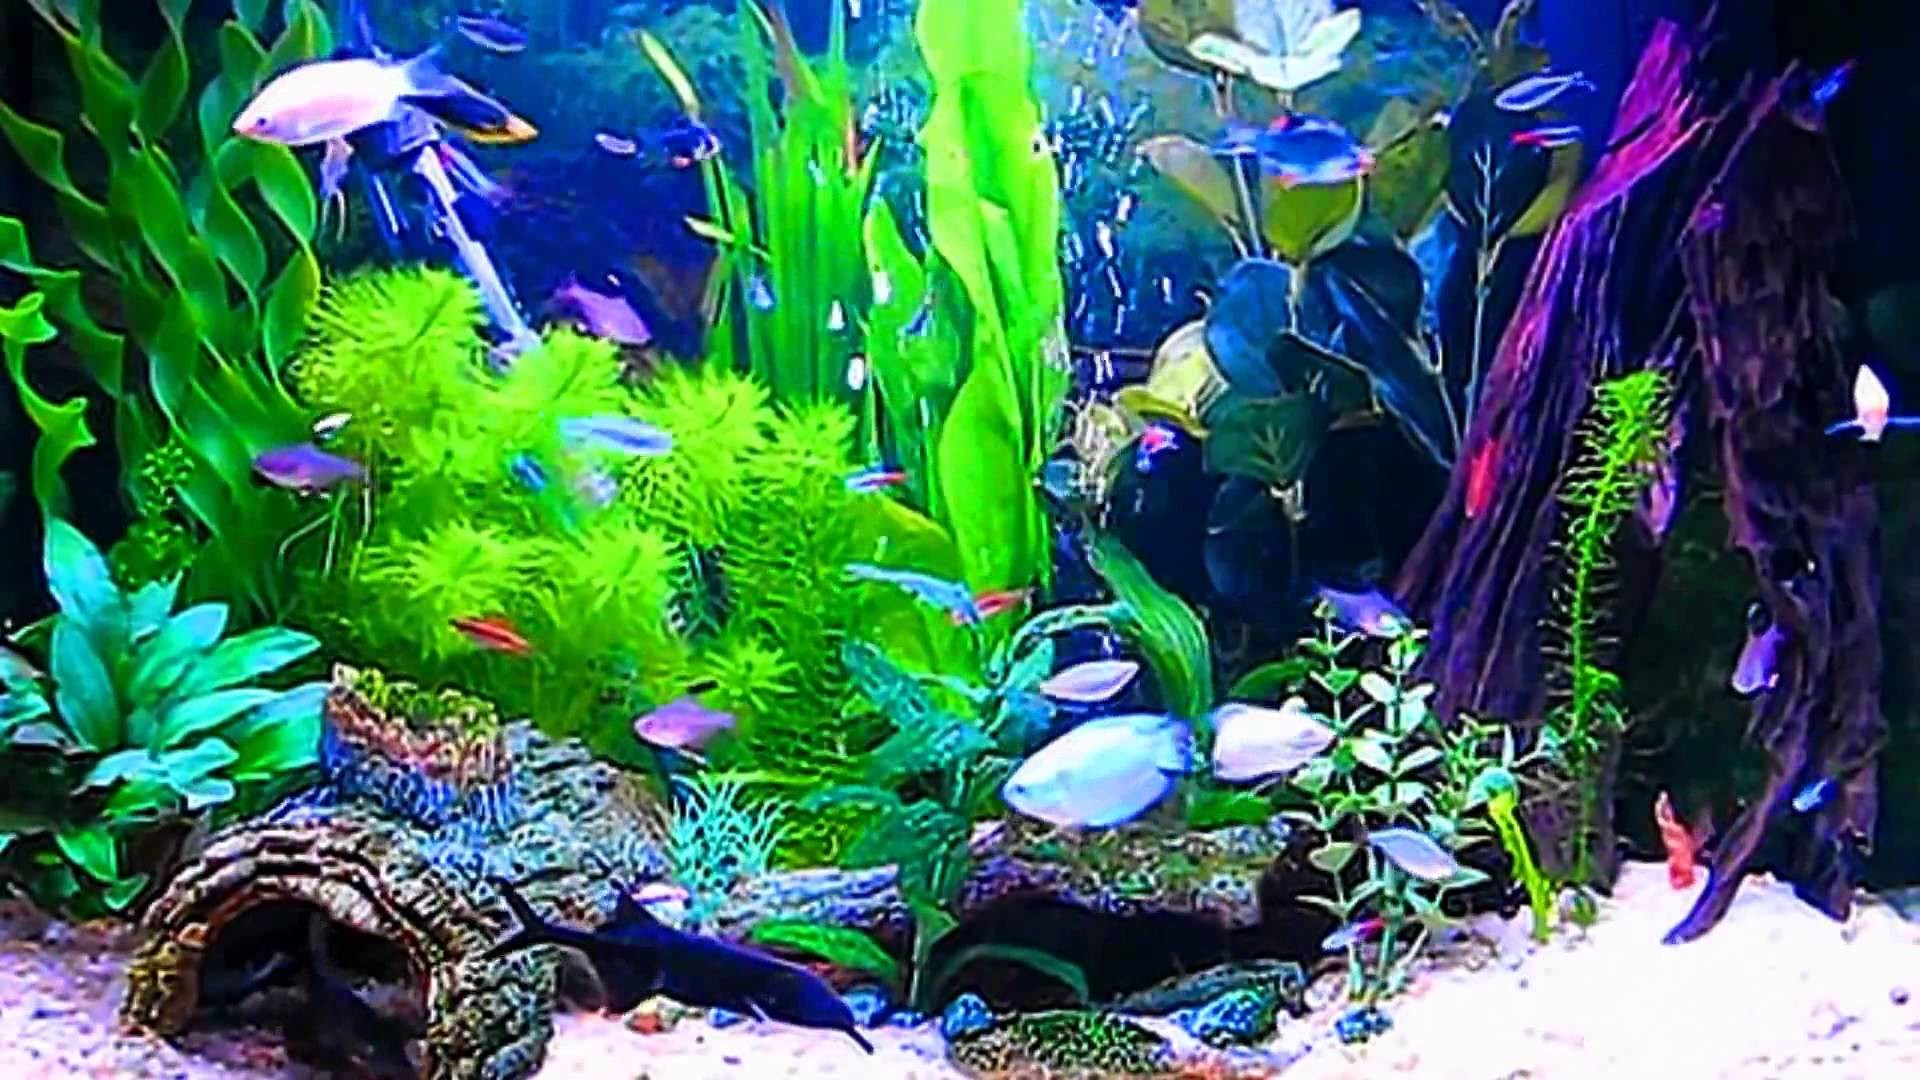 Amazing HD Aquarium ScreenSaver Free Windows and Android Full HD .